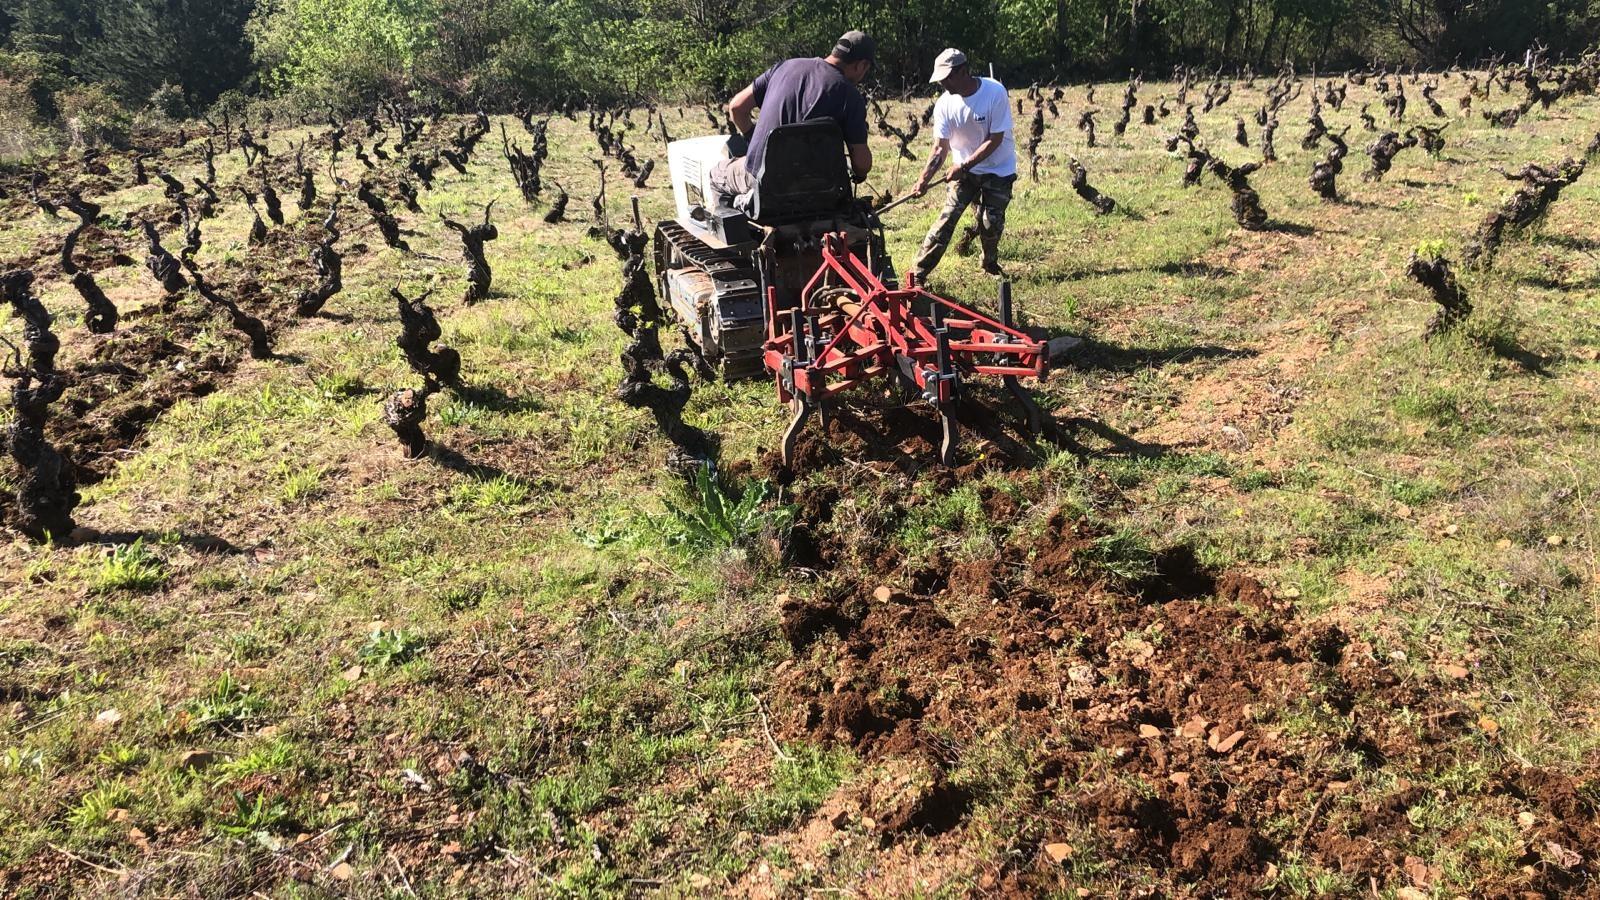 hija de anibal winemakers fertilyzing ground on vineyard near winery